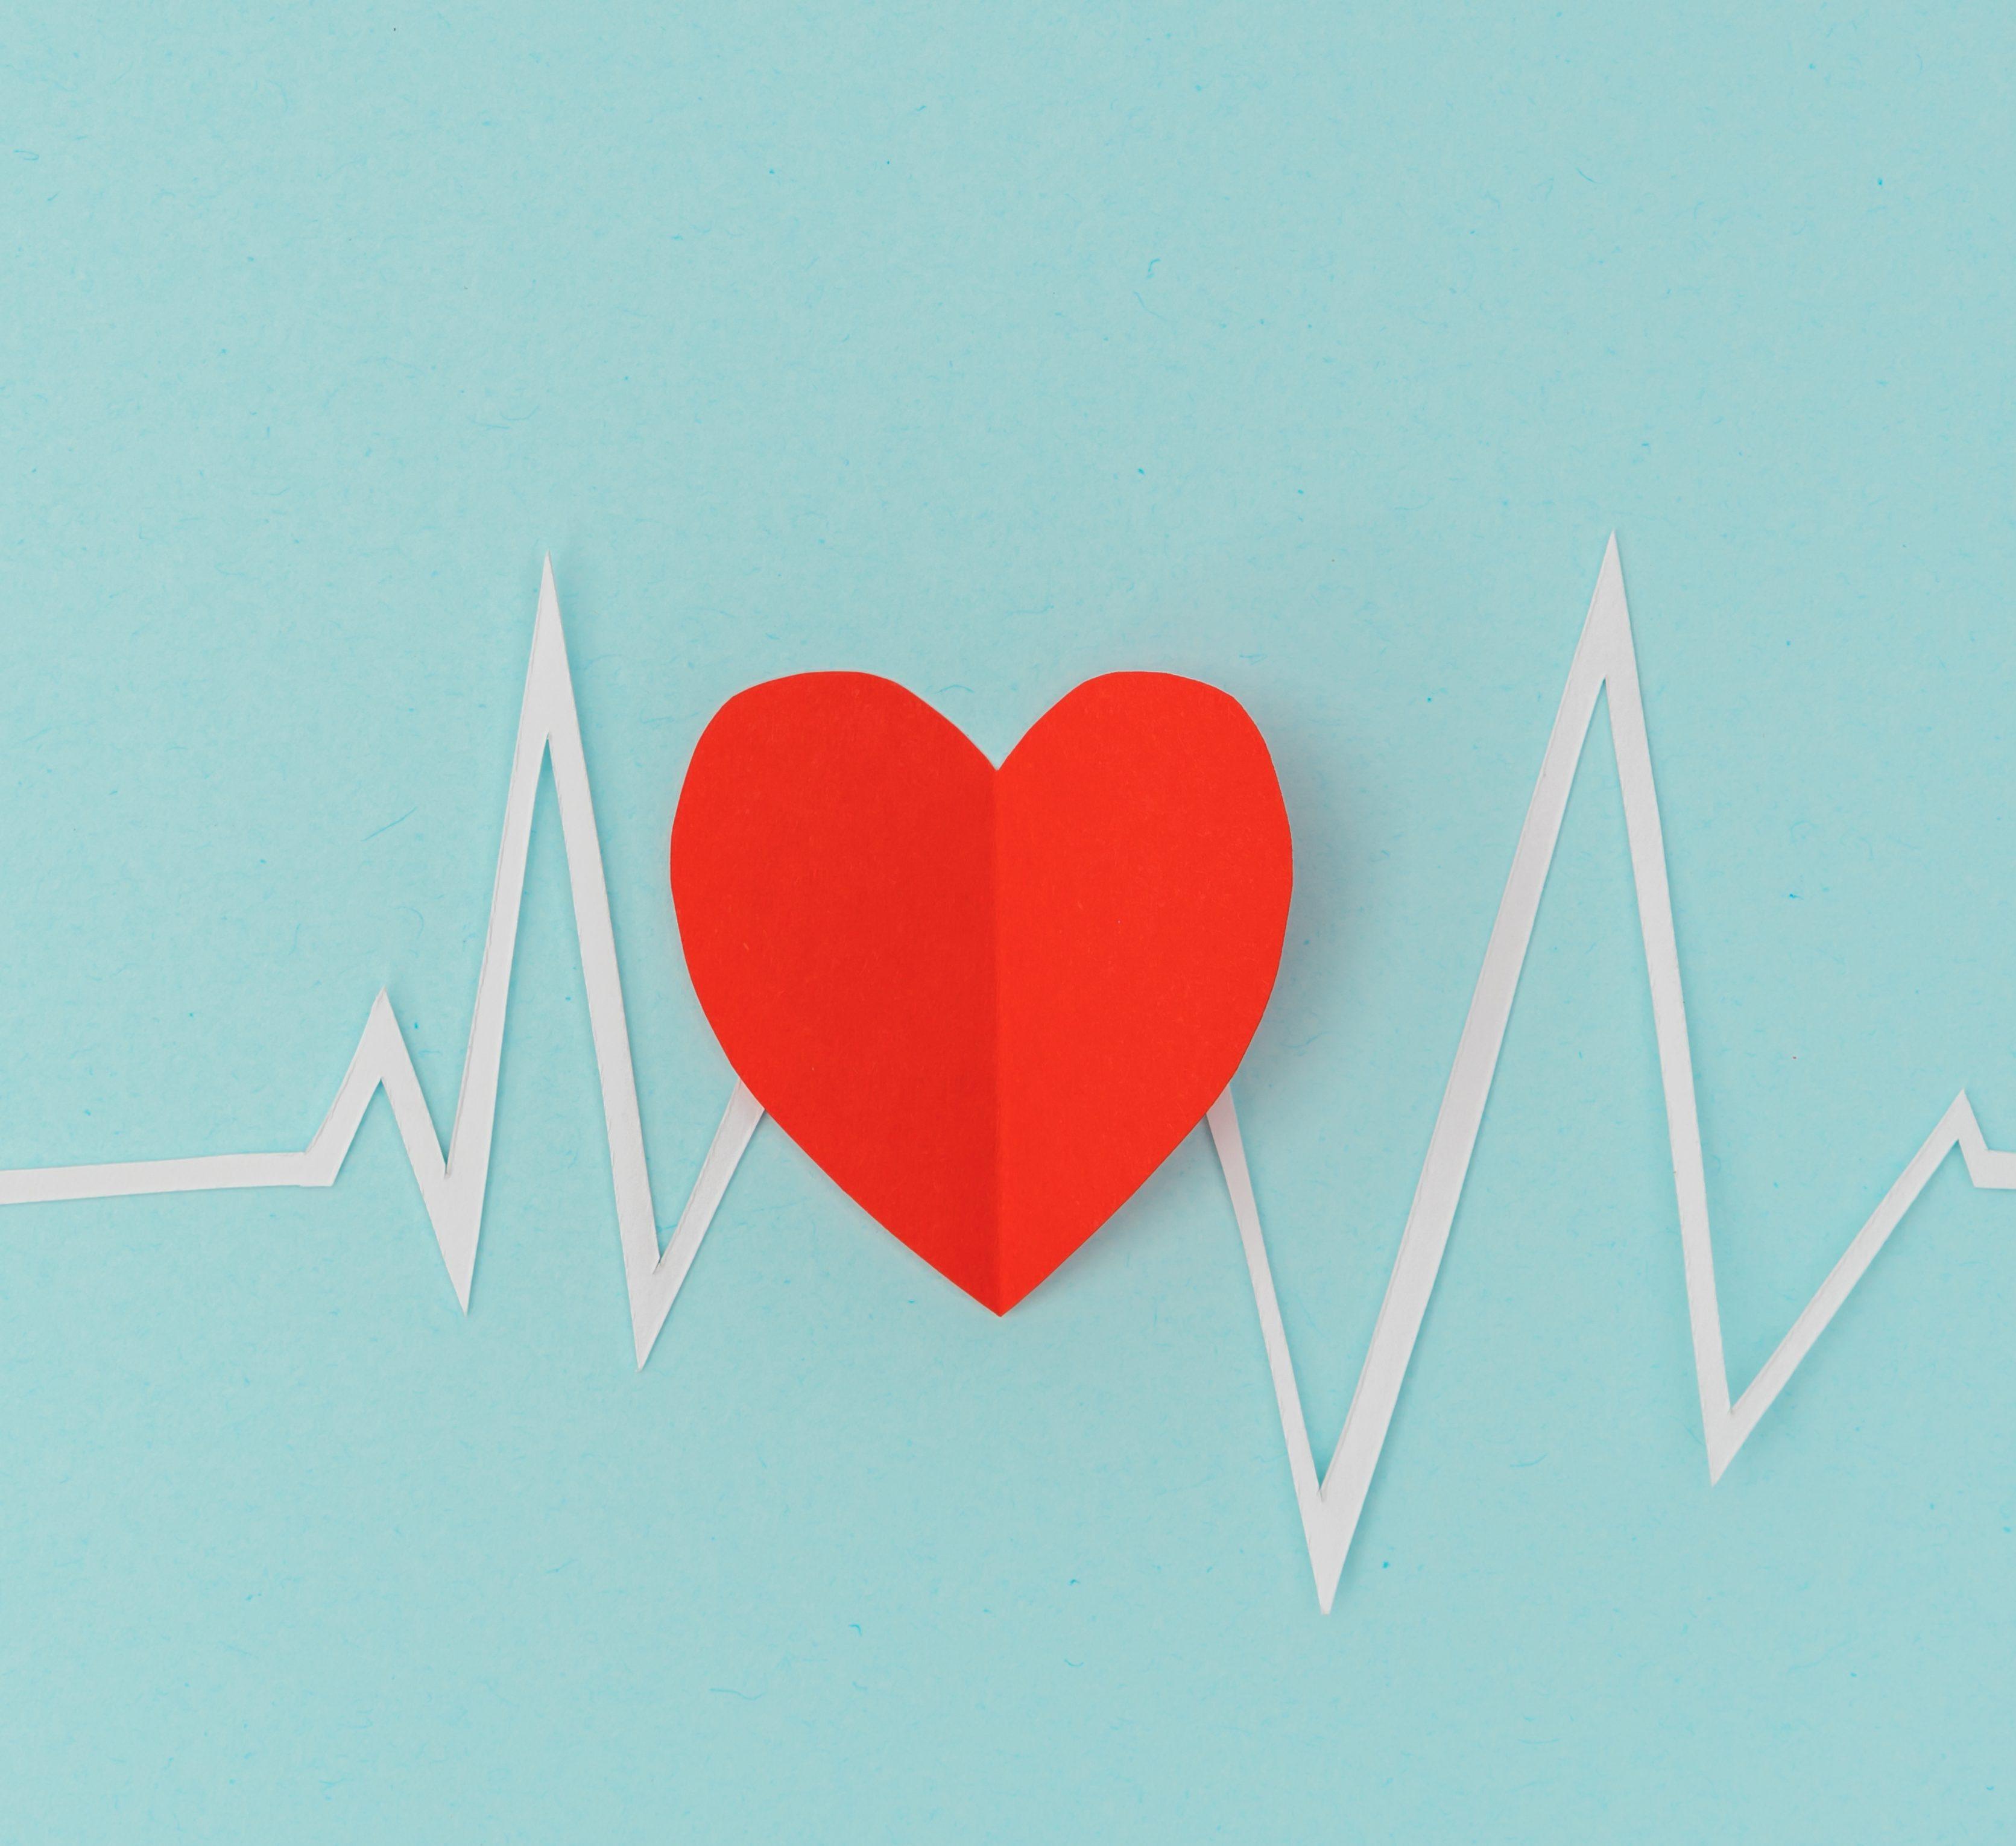 Paper cut of cardiogram of heart rhythm